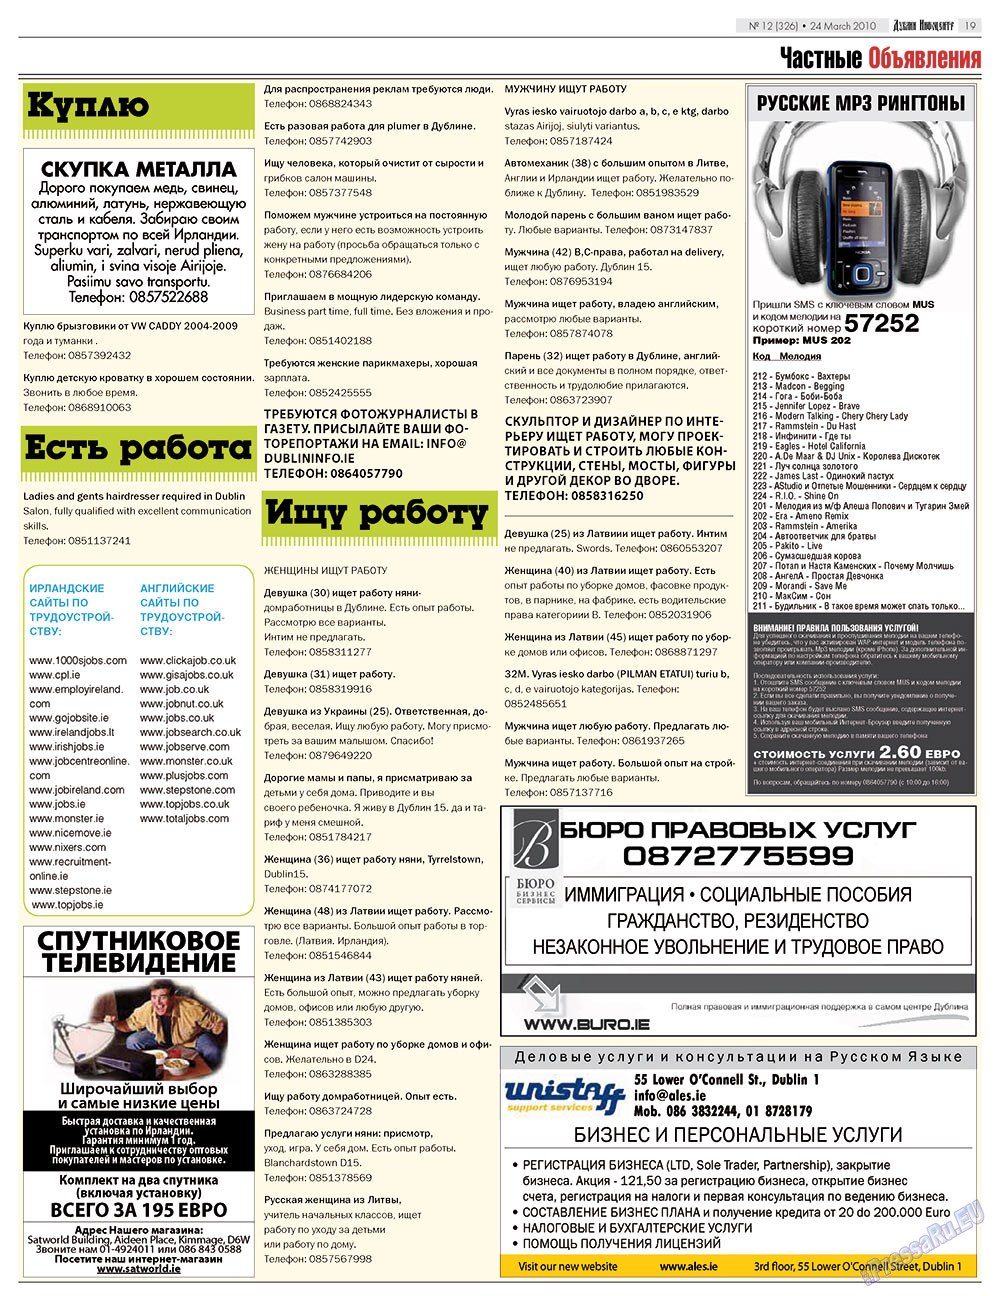 Дублин инфоцентр (газета). 2010 год, номер 12, стр. 19